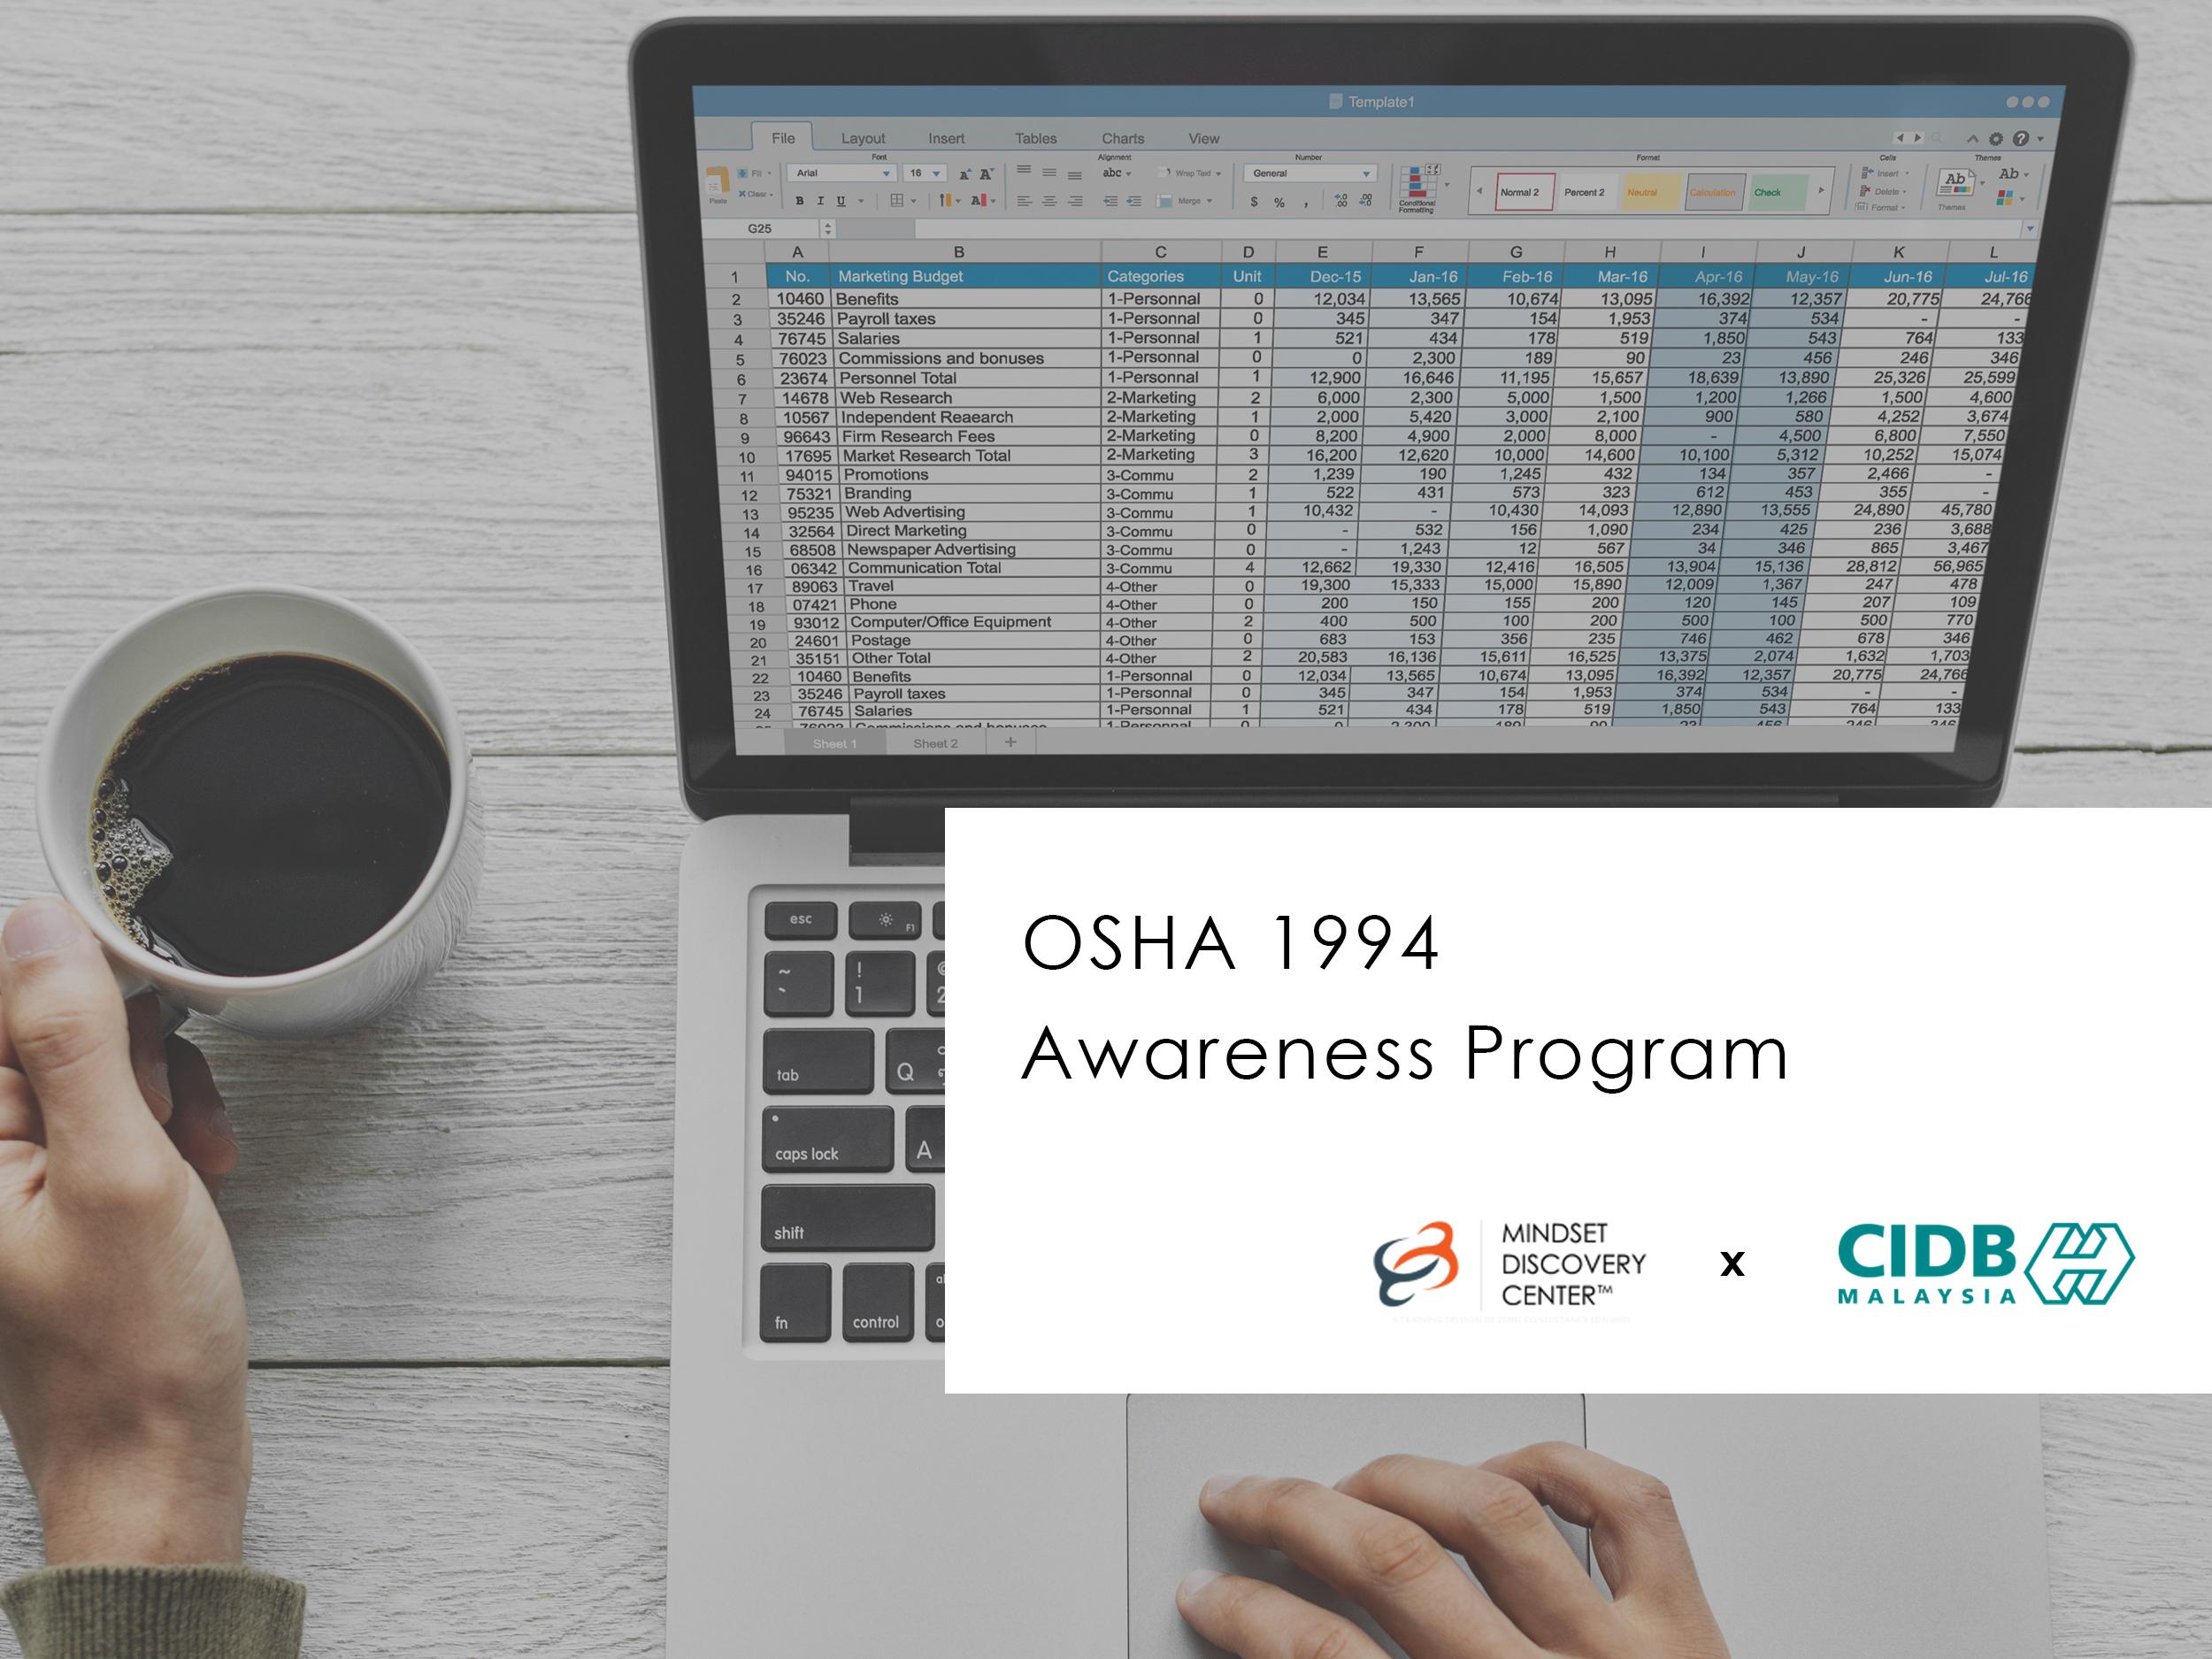 Occupational Safety & Health Act (OSHA) 1994 Awareness Program